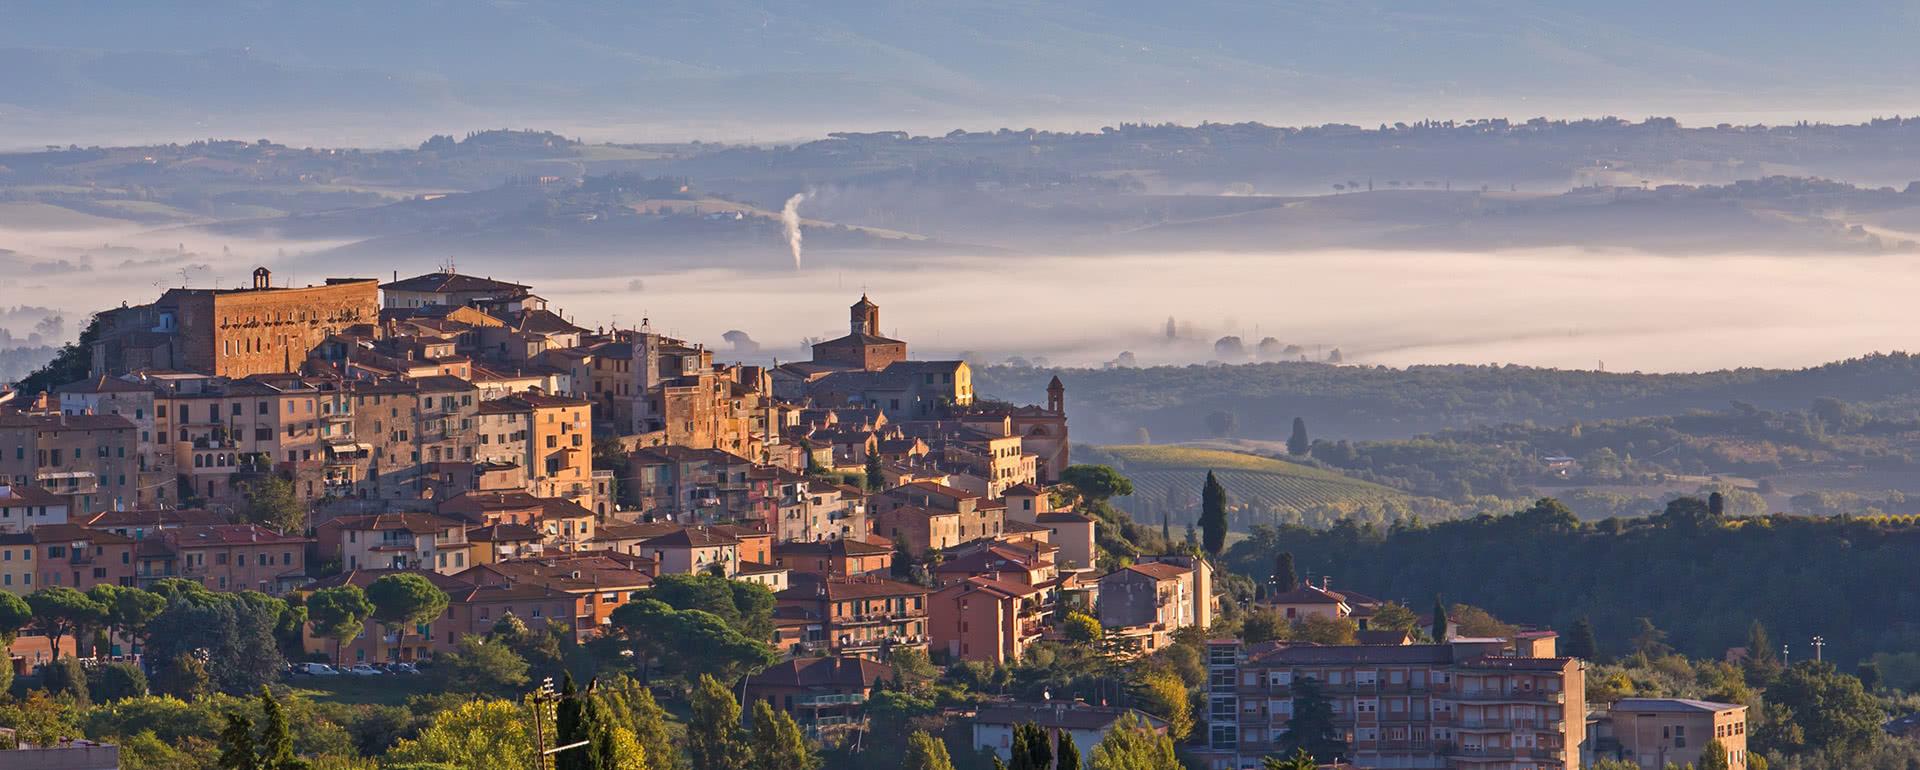 Titelbild von Chianciano Terme